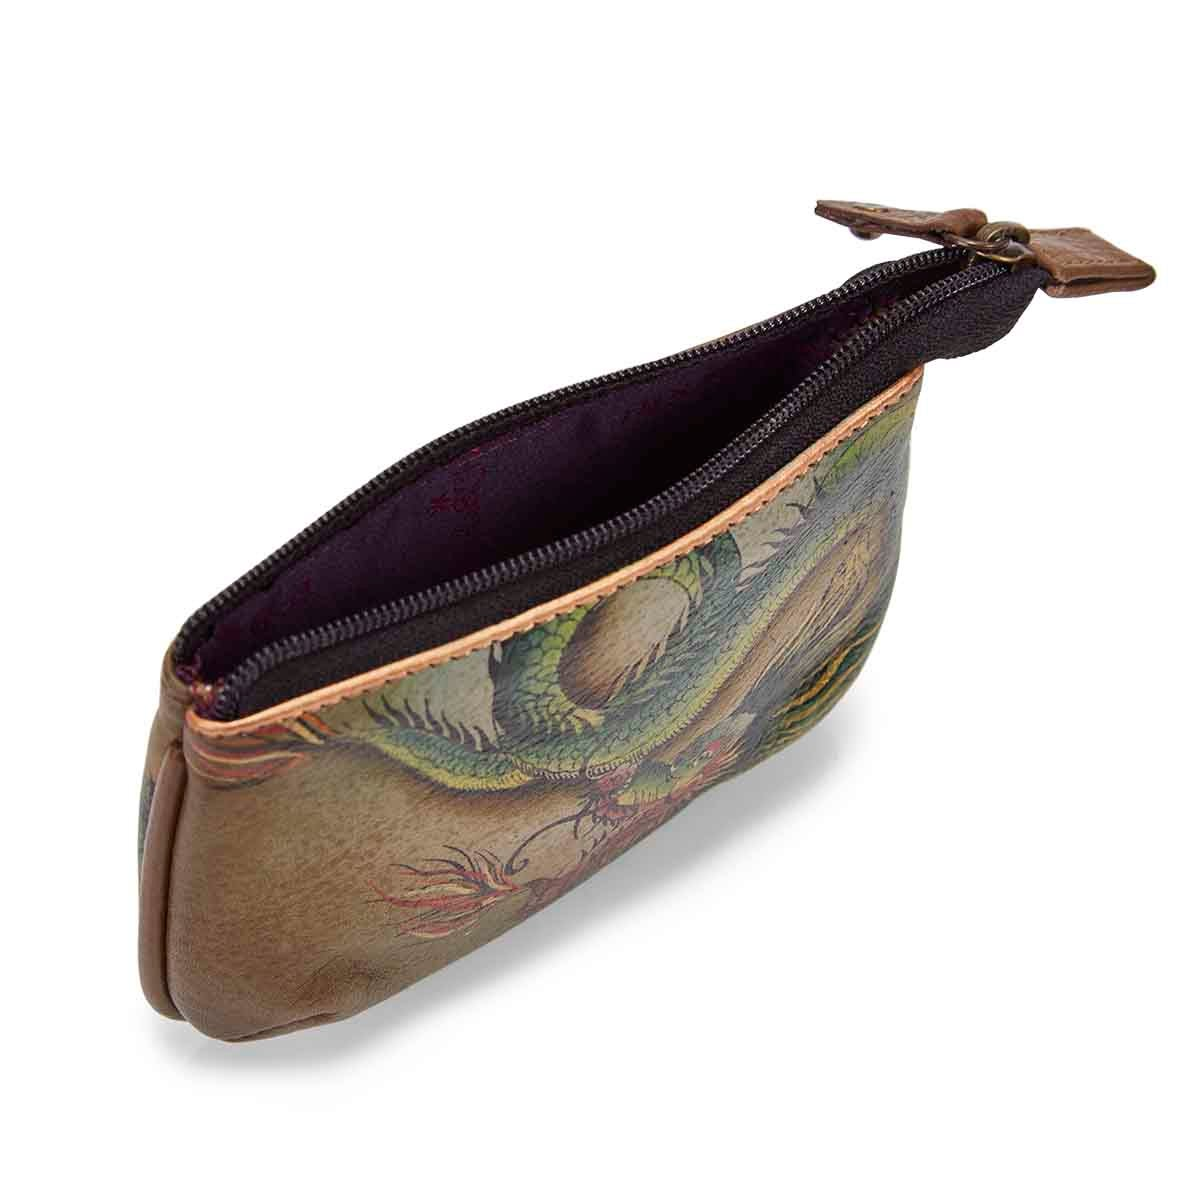 Painted lthr Hidden Dragon coin purse